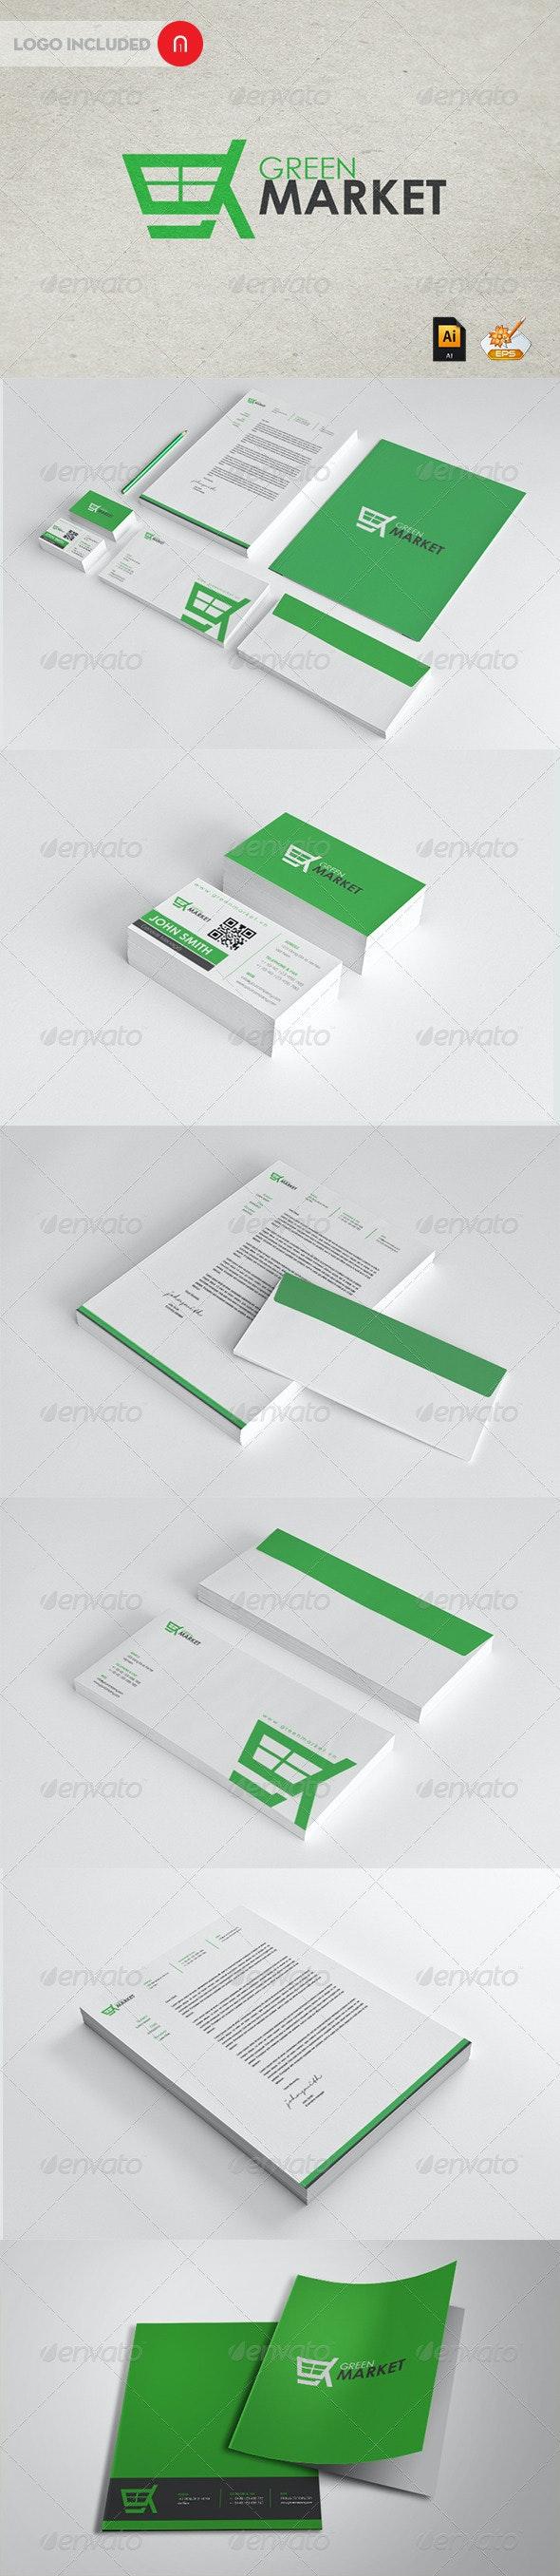 Green Market Corporate Identity - Stationery Print Templates